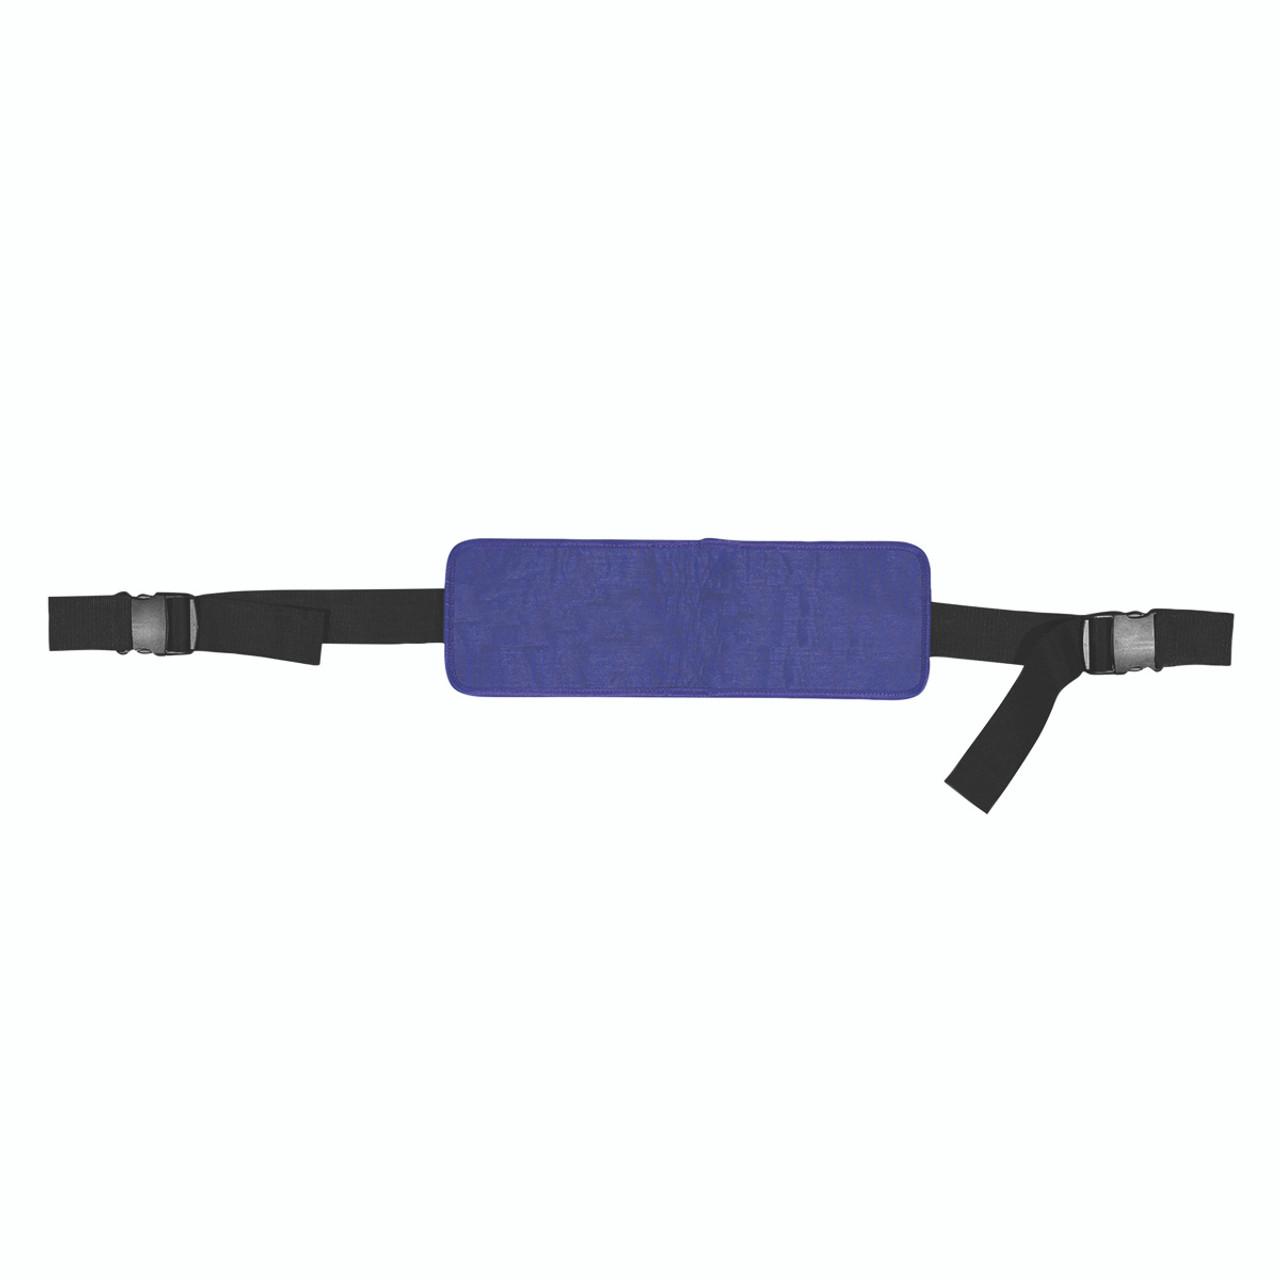 Alliance¨ patient lift sling SPS (Single Patient Specific) Medium (600 lb); no head support